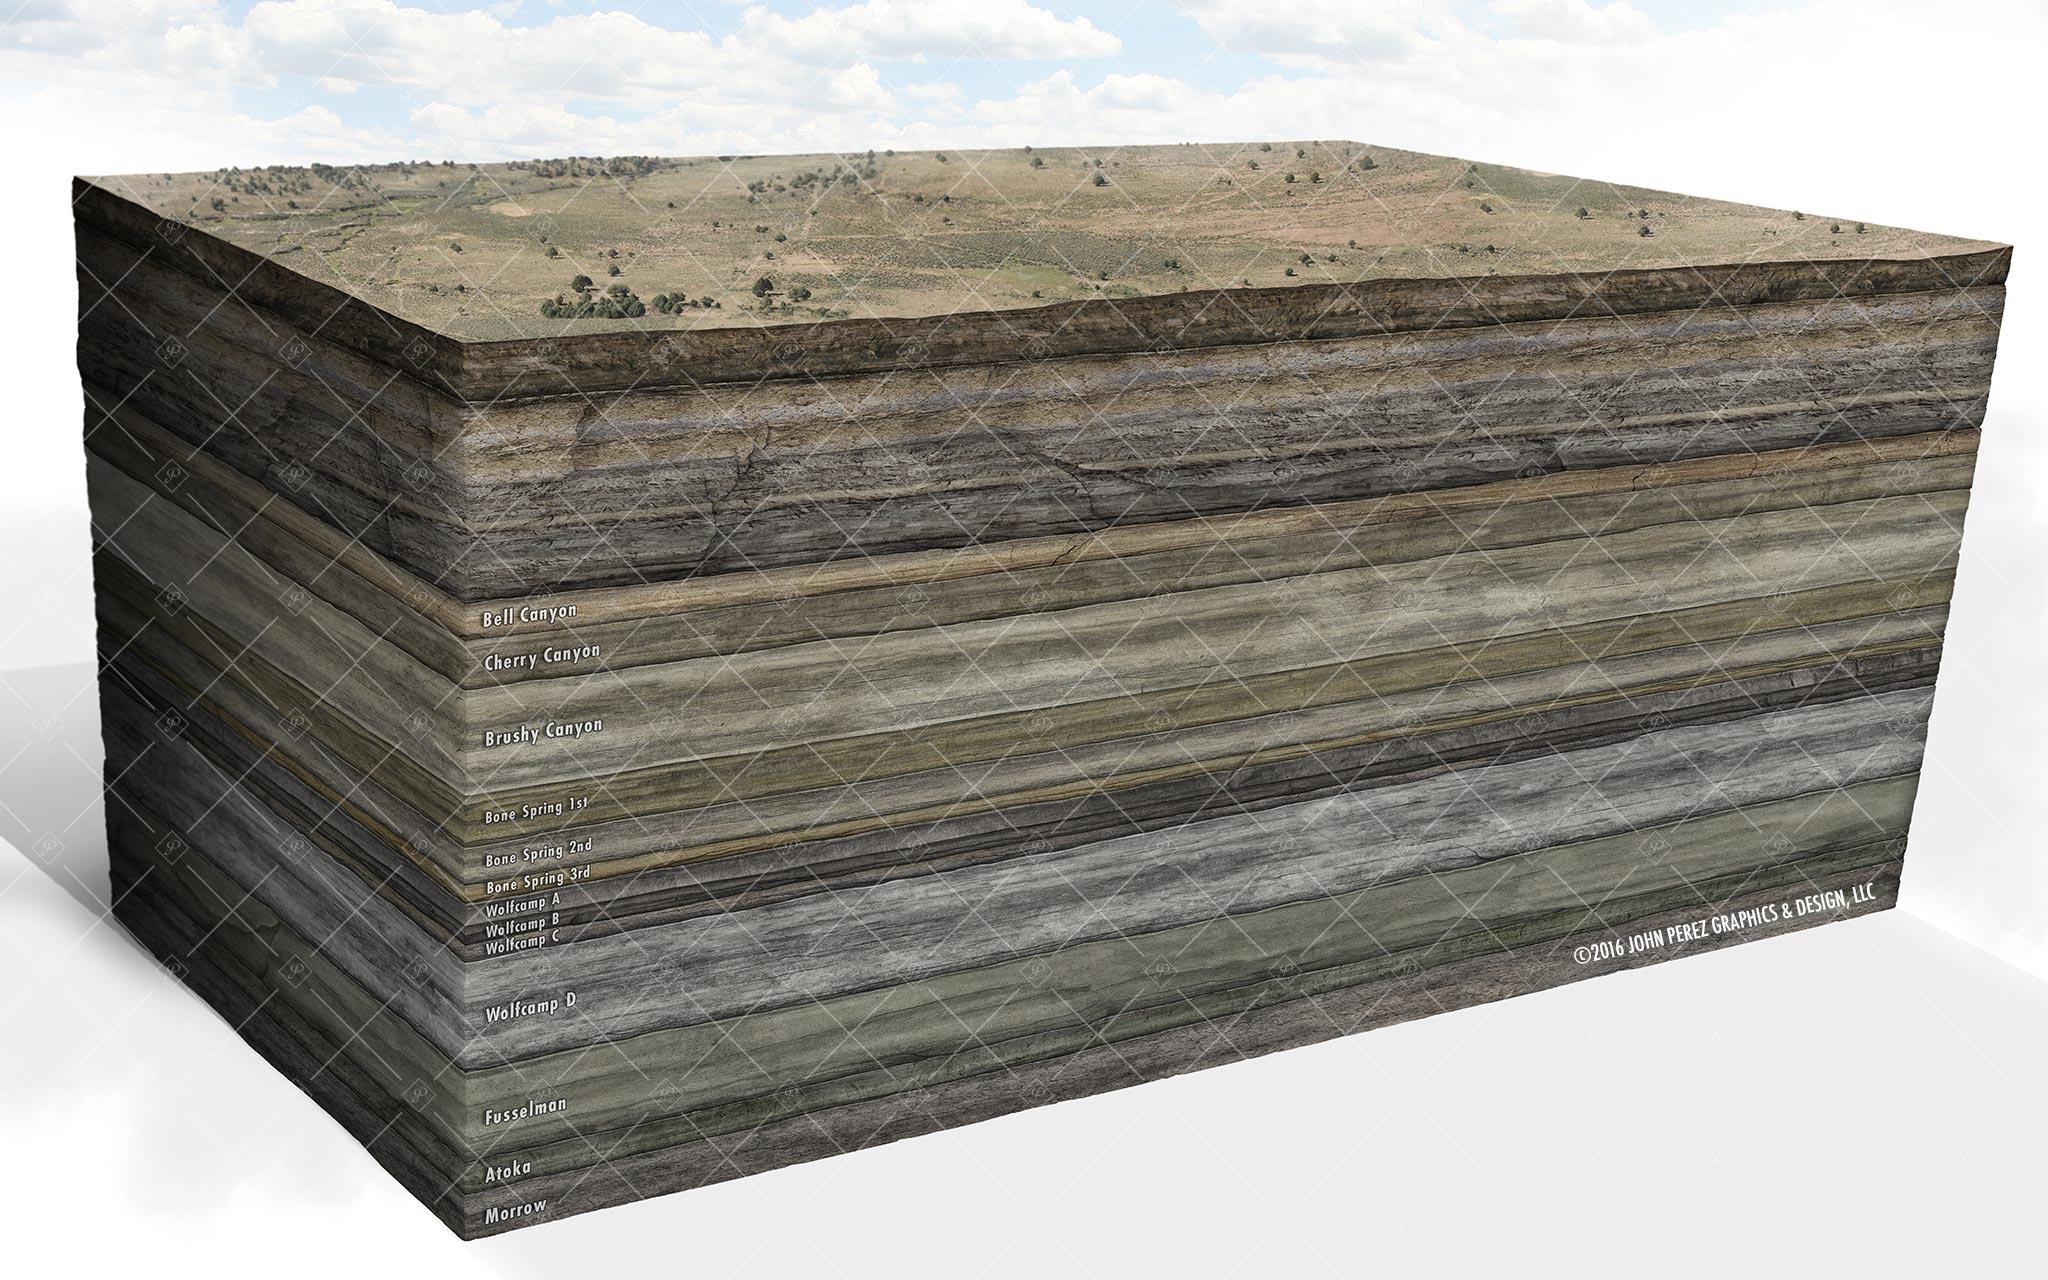 john perez graphic, Permian Basin geology, drilling geology, oil and gas graphics, oil and gas schematics, Permian Basin Map